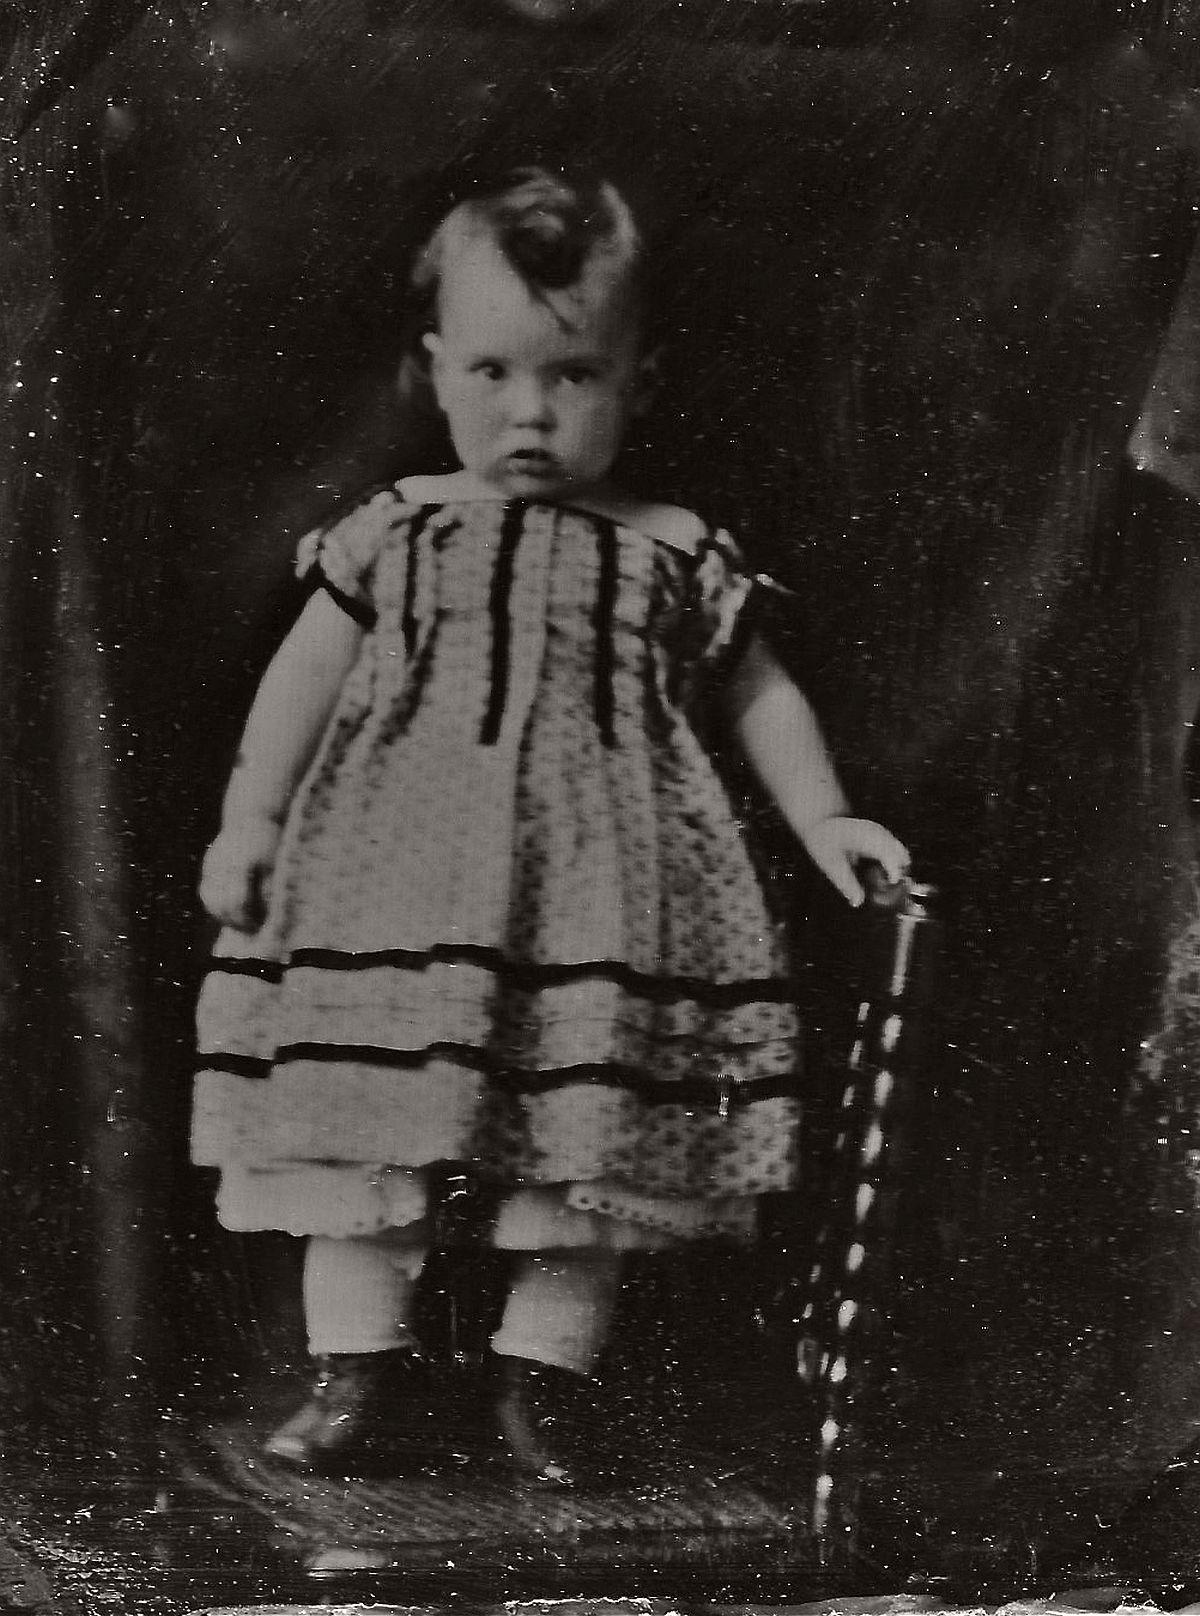 victorian-era-tintype-portraits-of-children-1870s-and-1880s-01